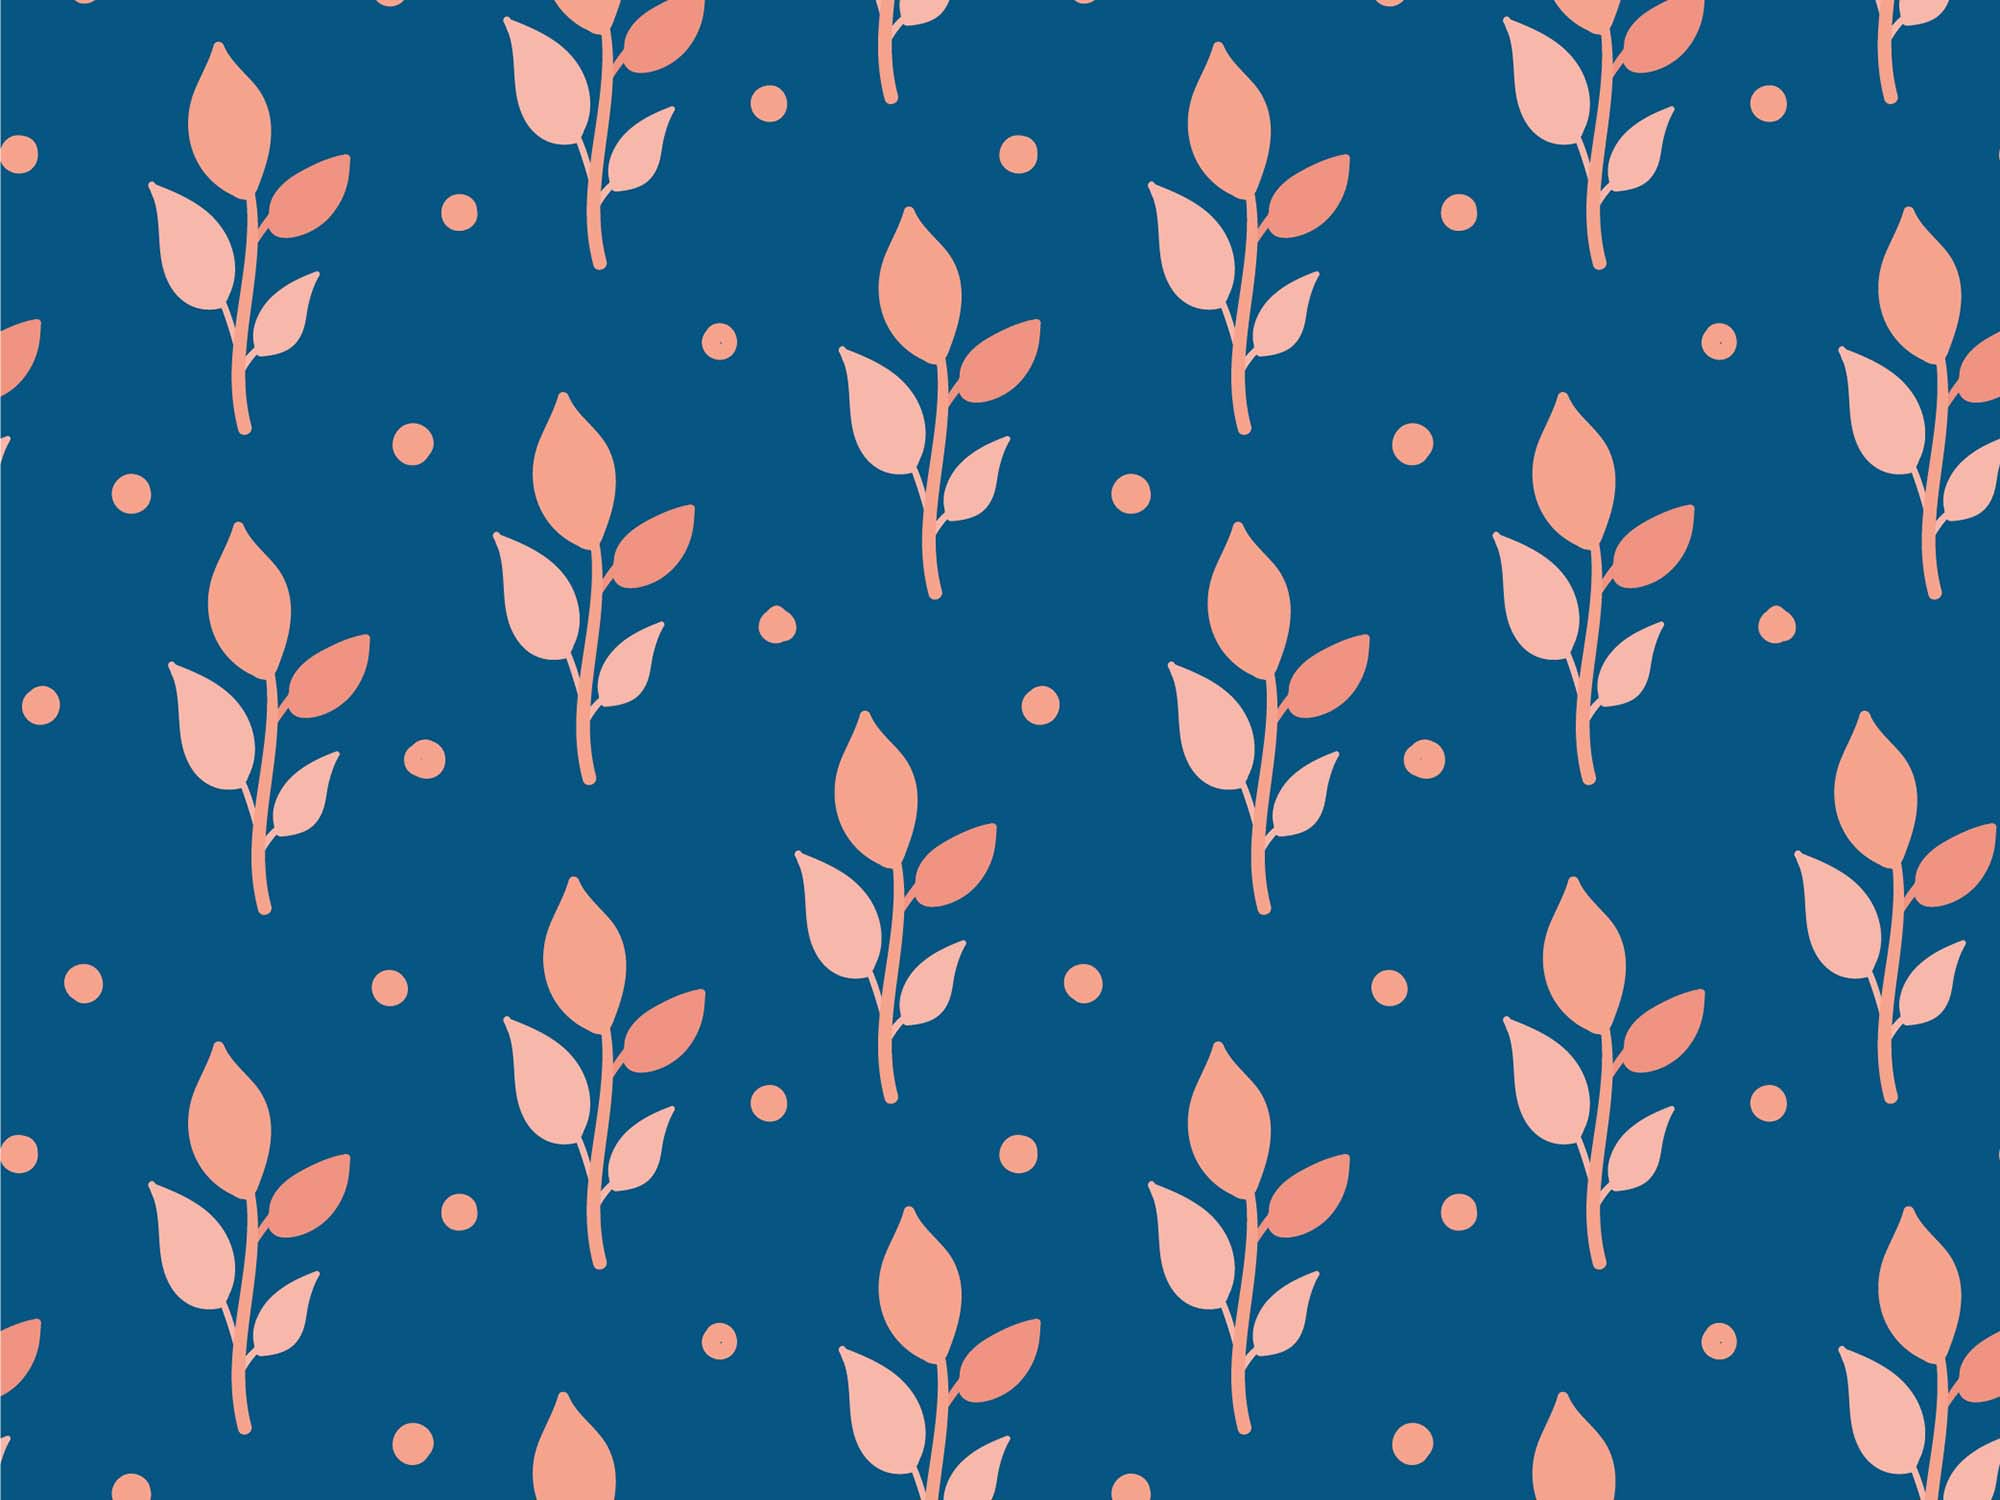 Floral Vector Patterns 4